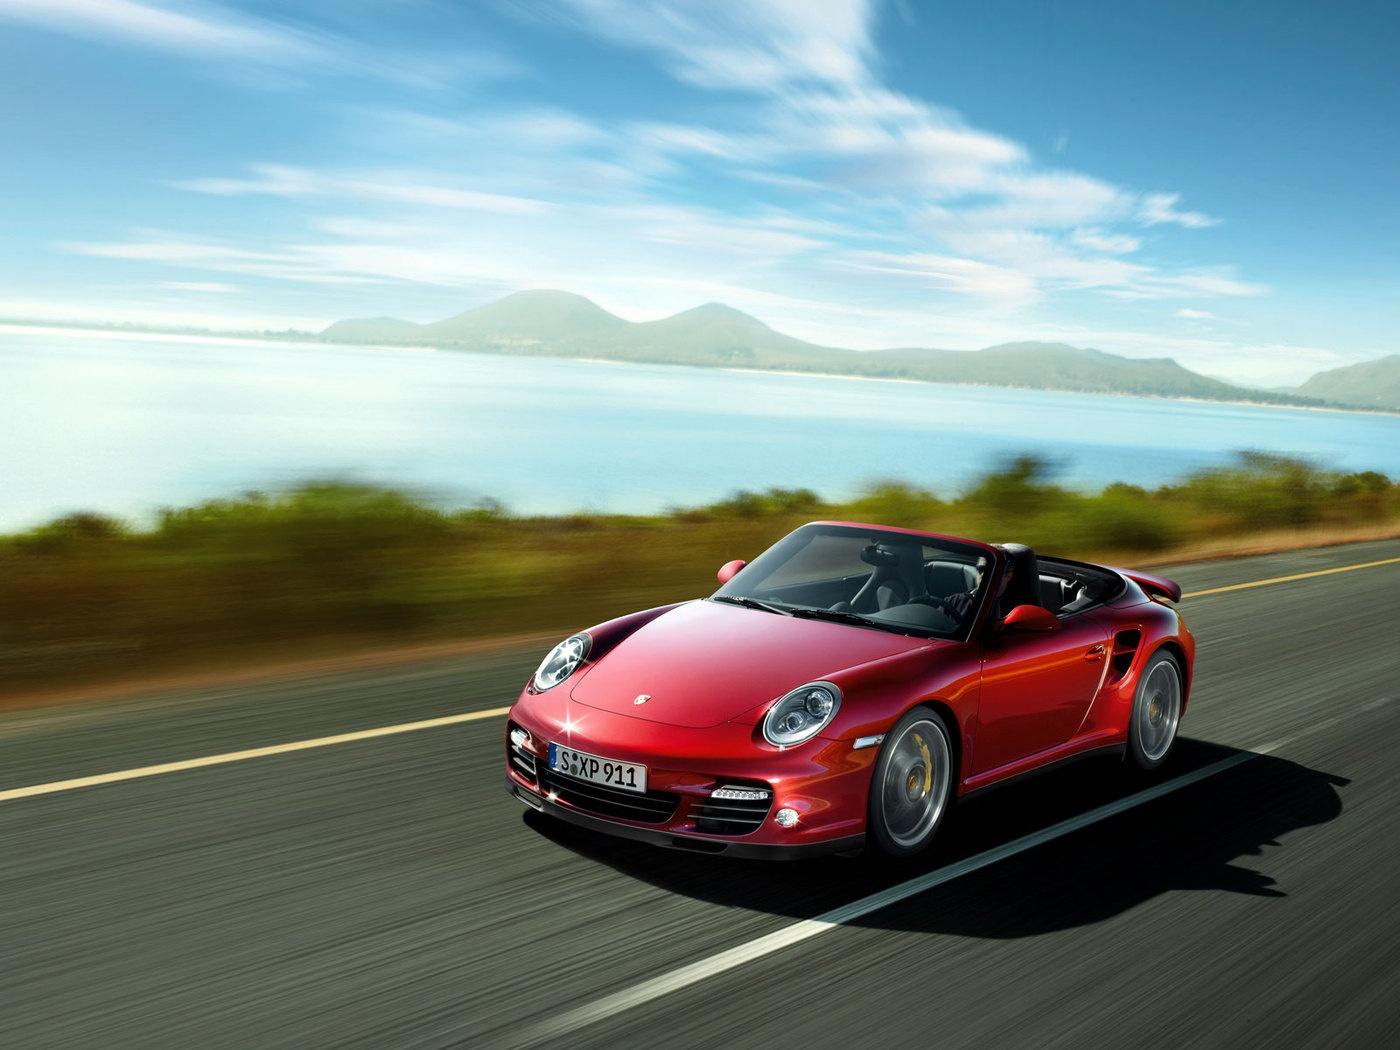 porsche 911 turbo cabrio wallpapers hd wallpapers